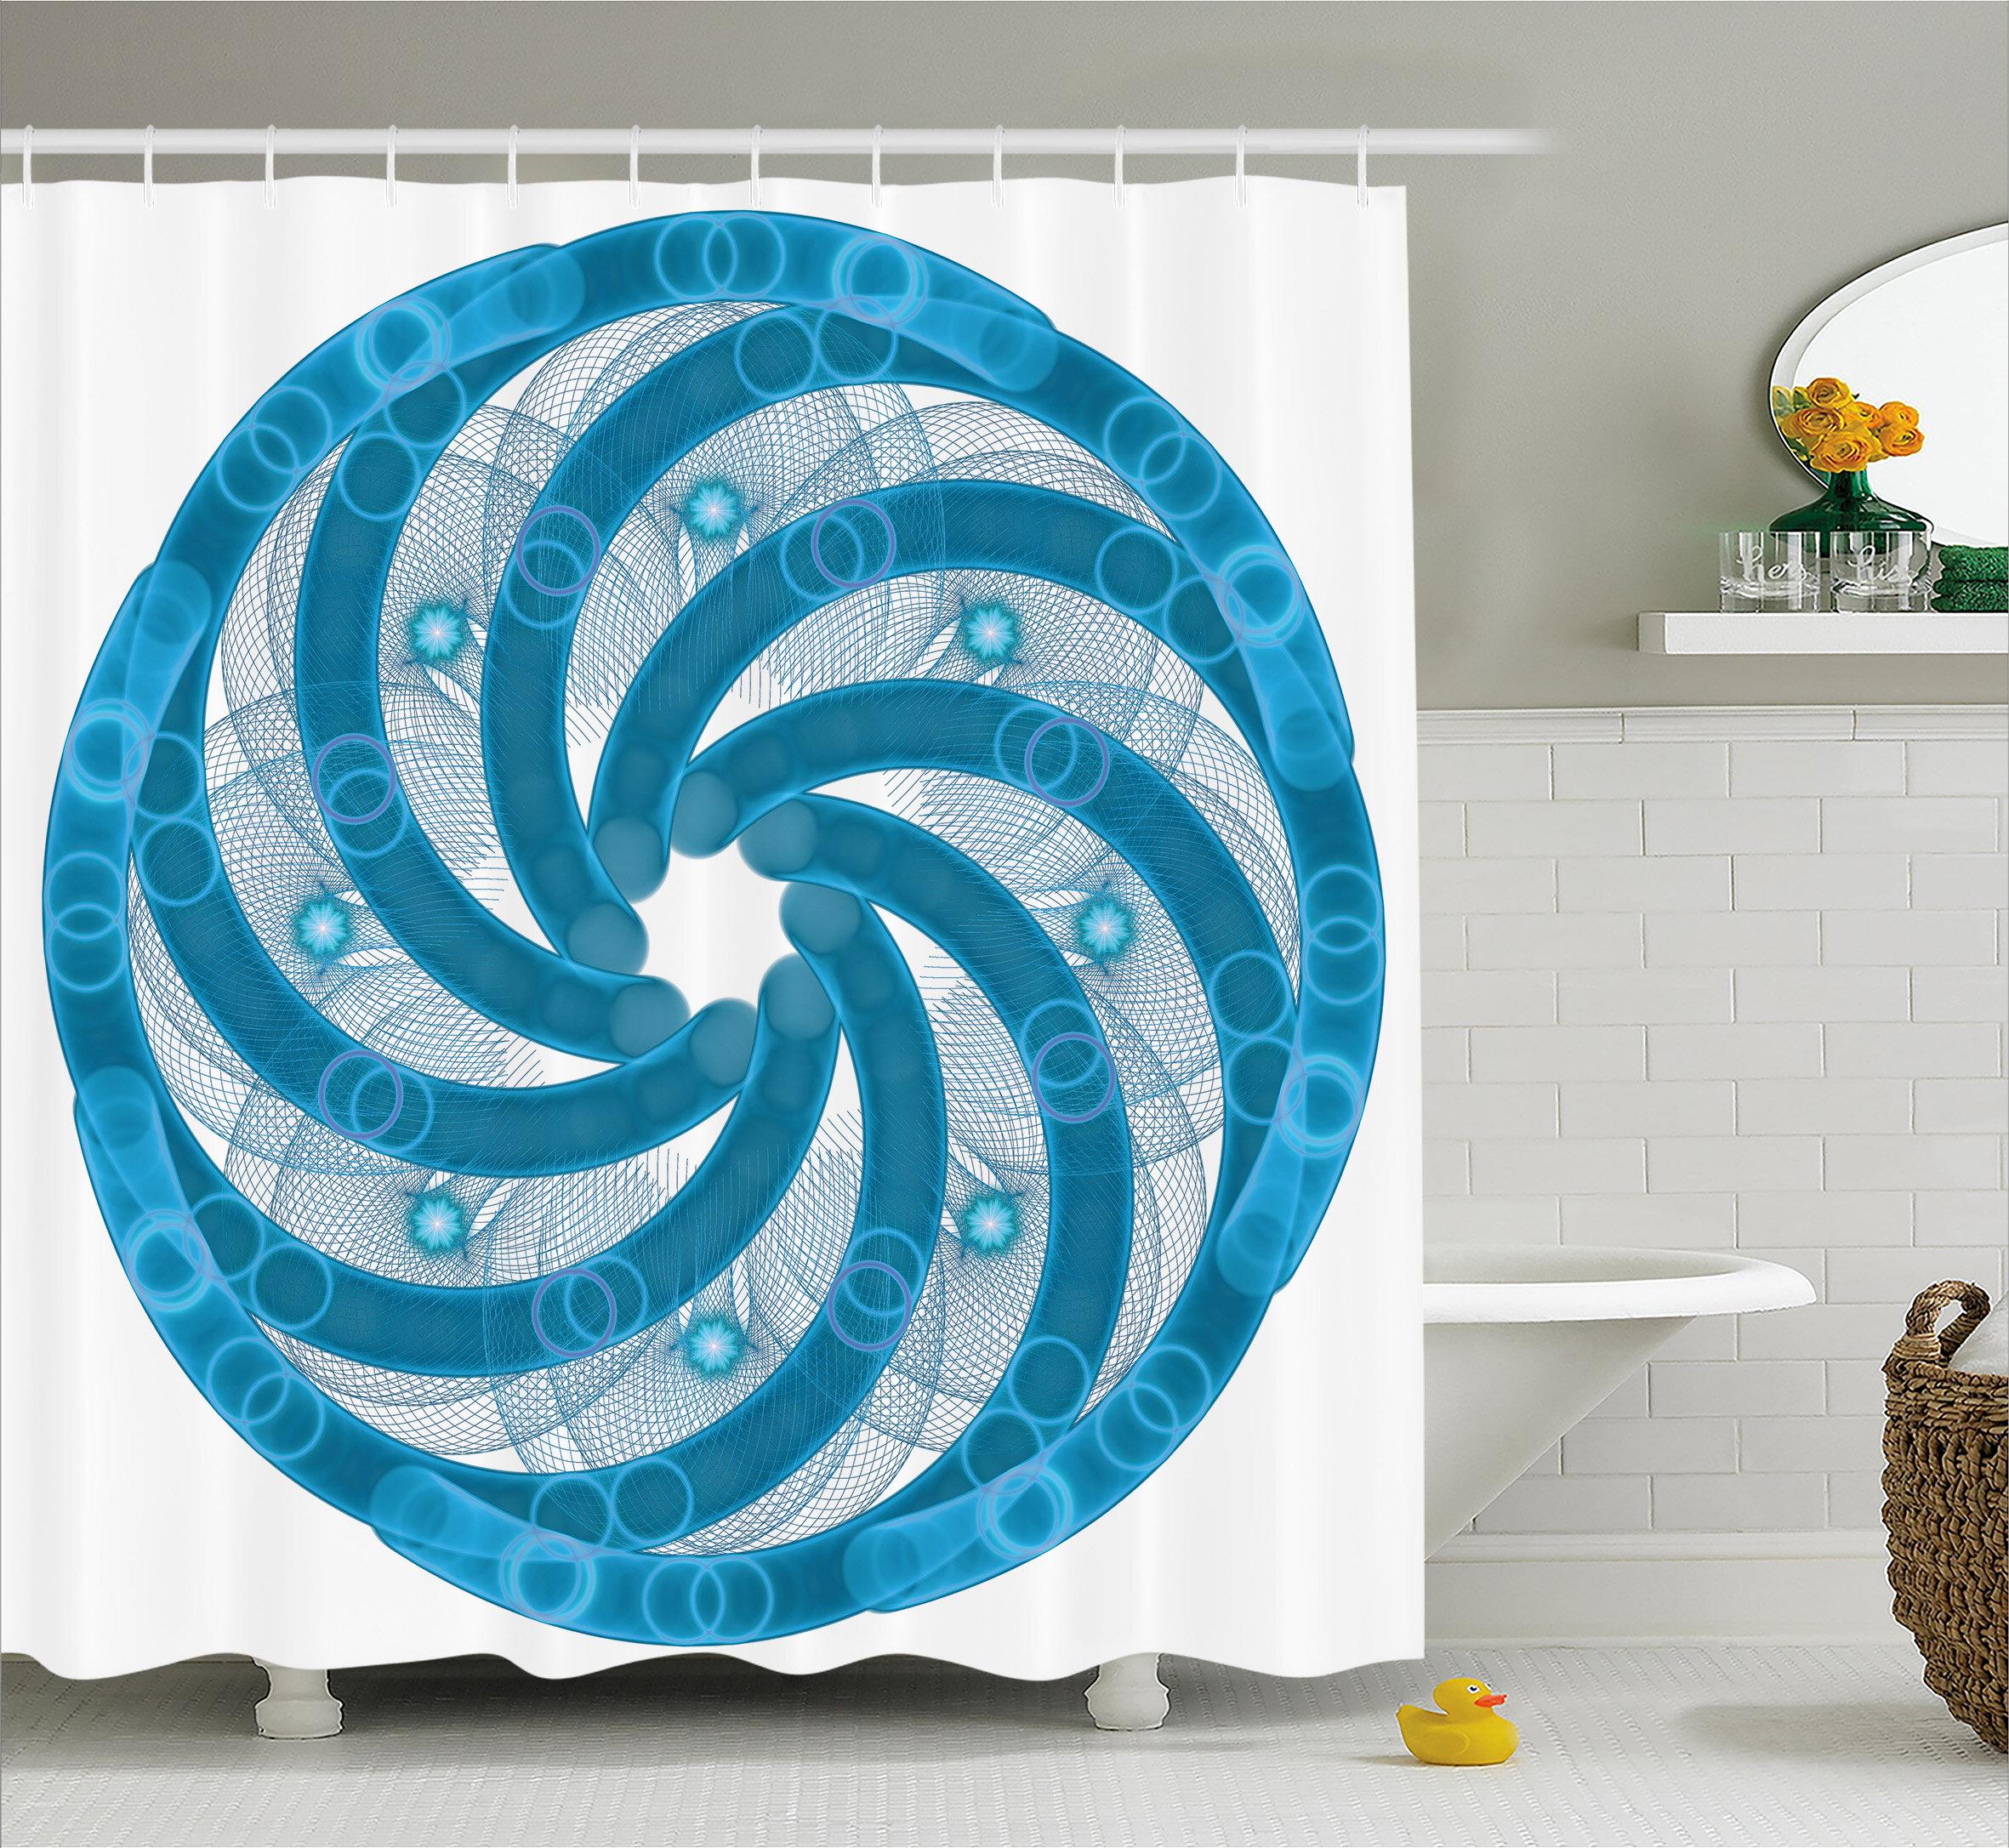 Ebern Designs Alberto Abstract Fractal Artsy Shower Curtain